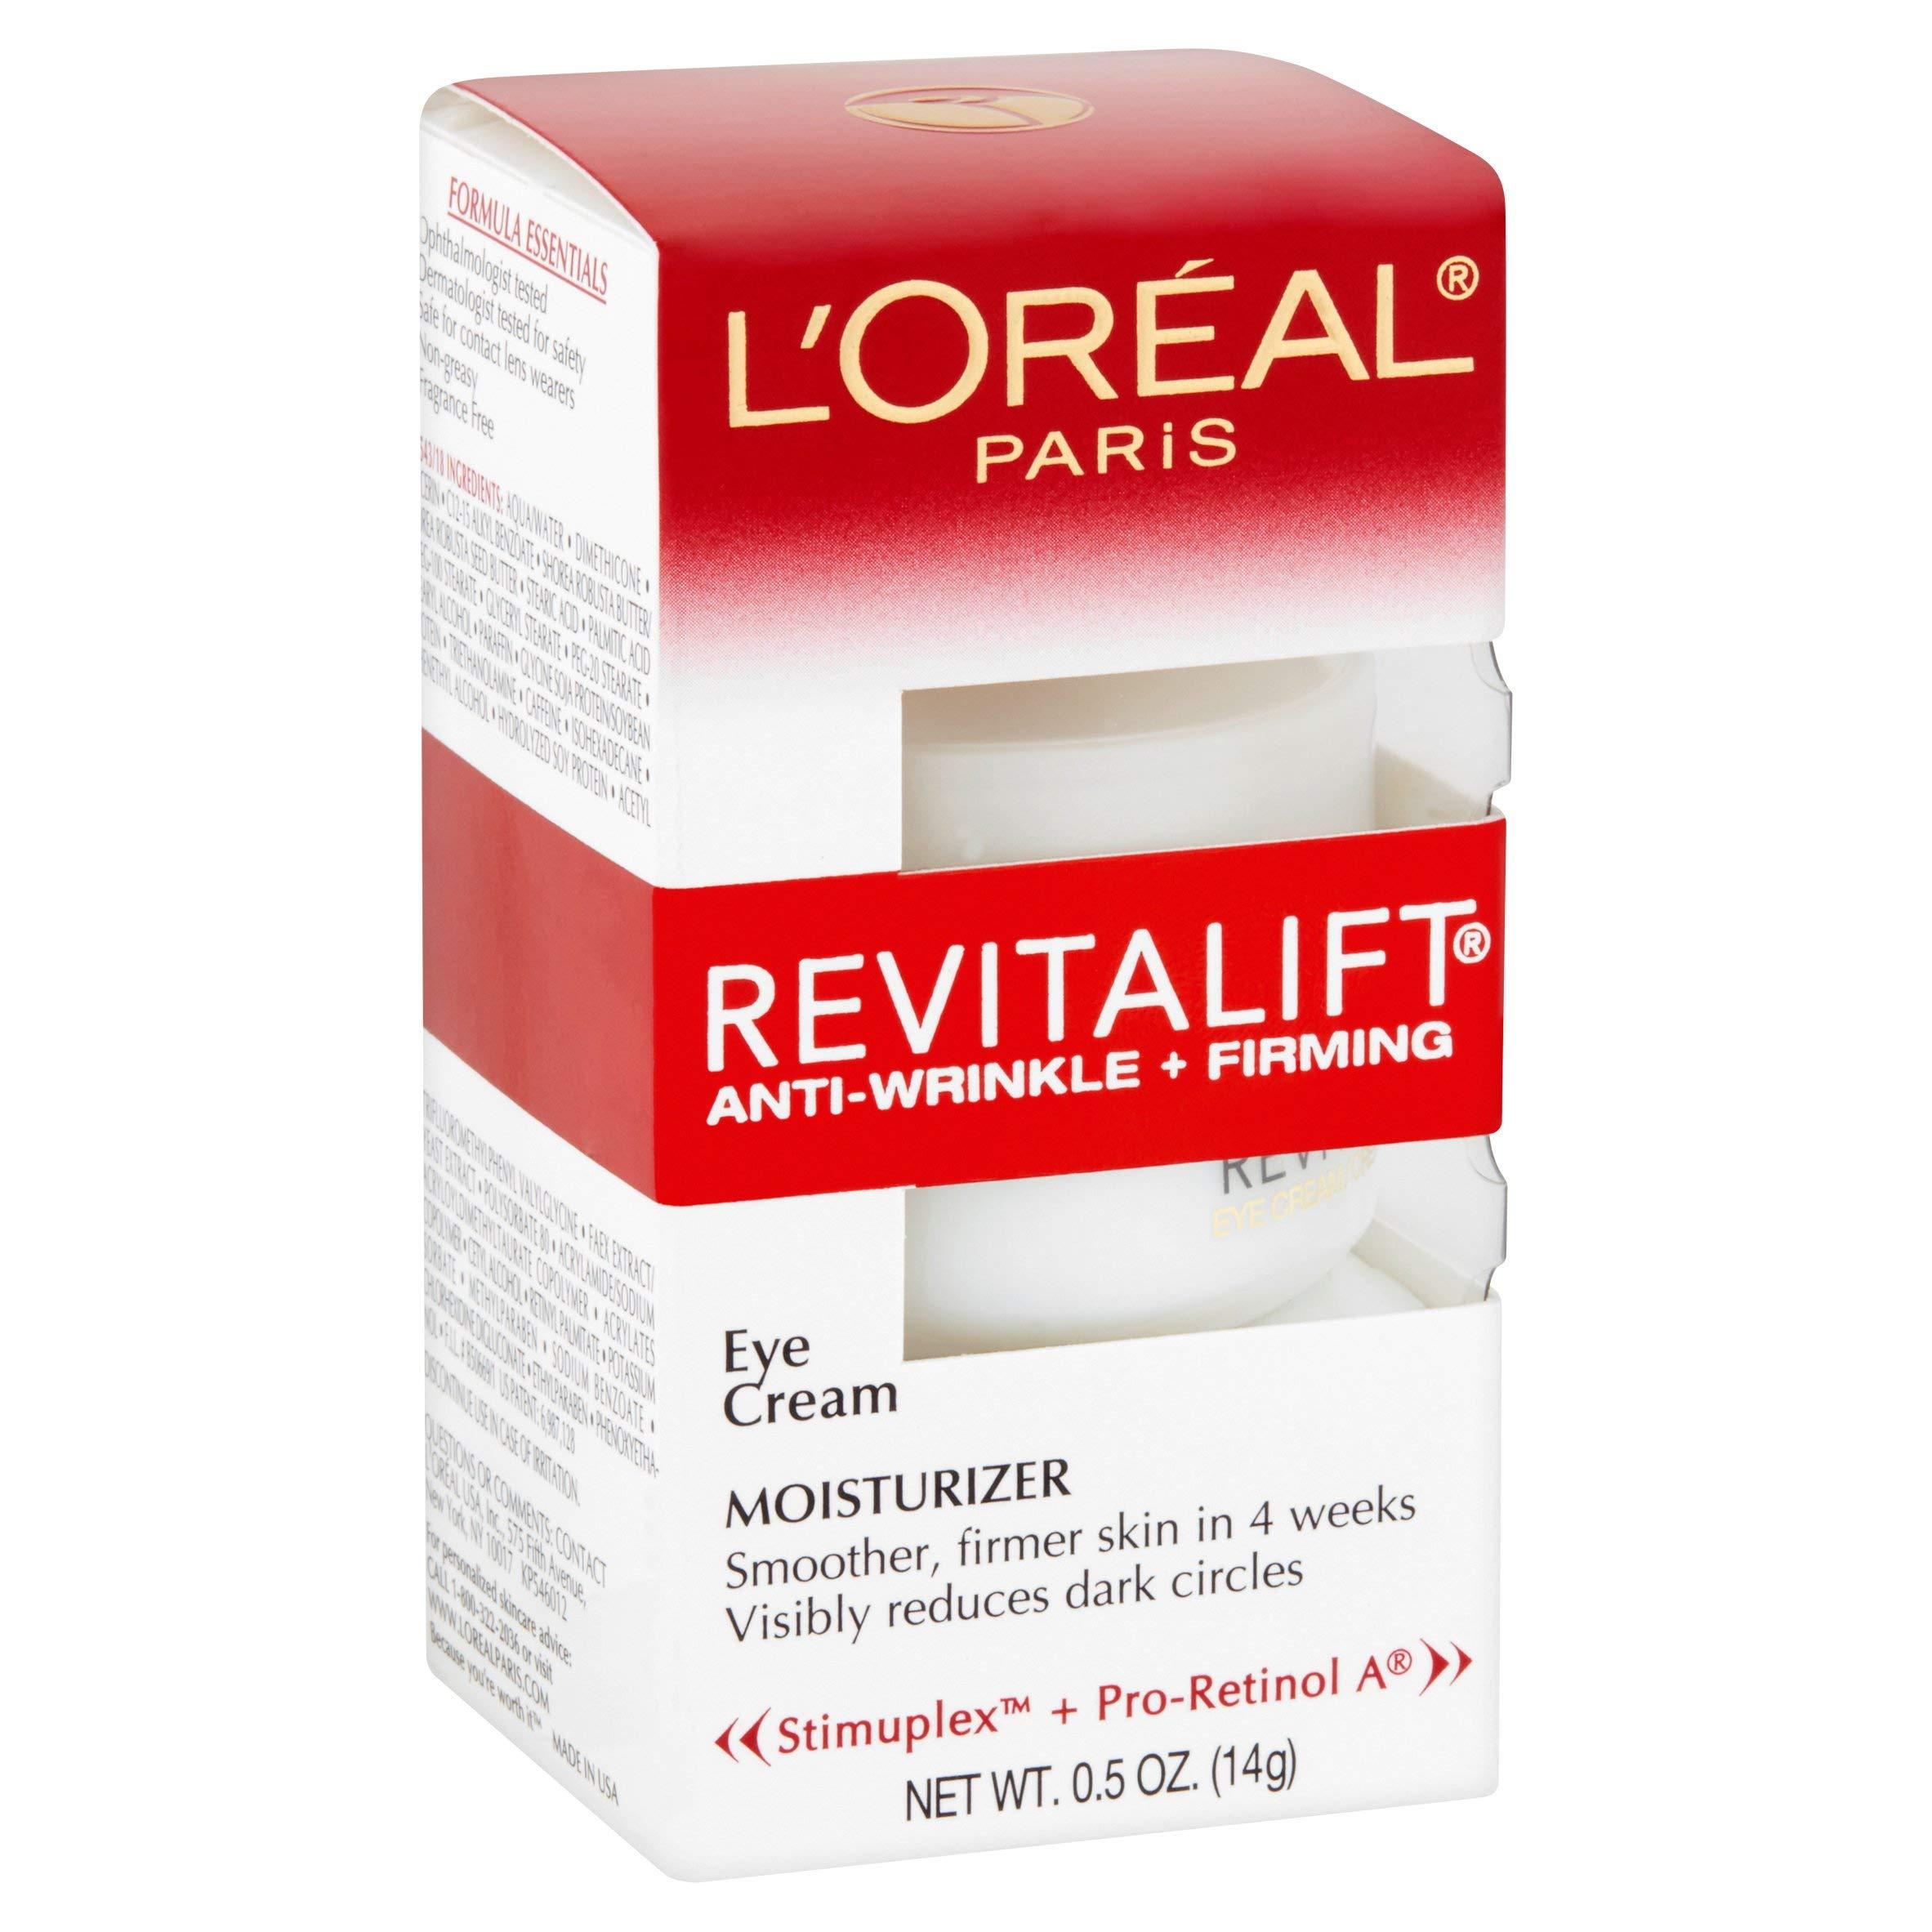 0.5-Oz L'Oreal Paris Revitalift Eye Cream 2 for $13.03 w/ S&S + Free Shipping w/ Prime or on $25+